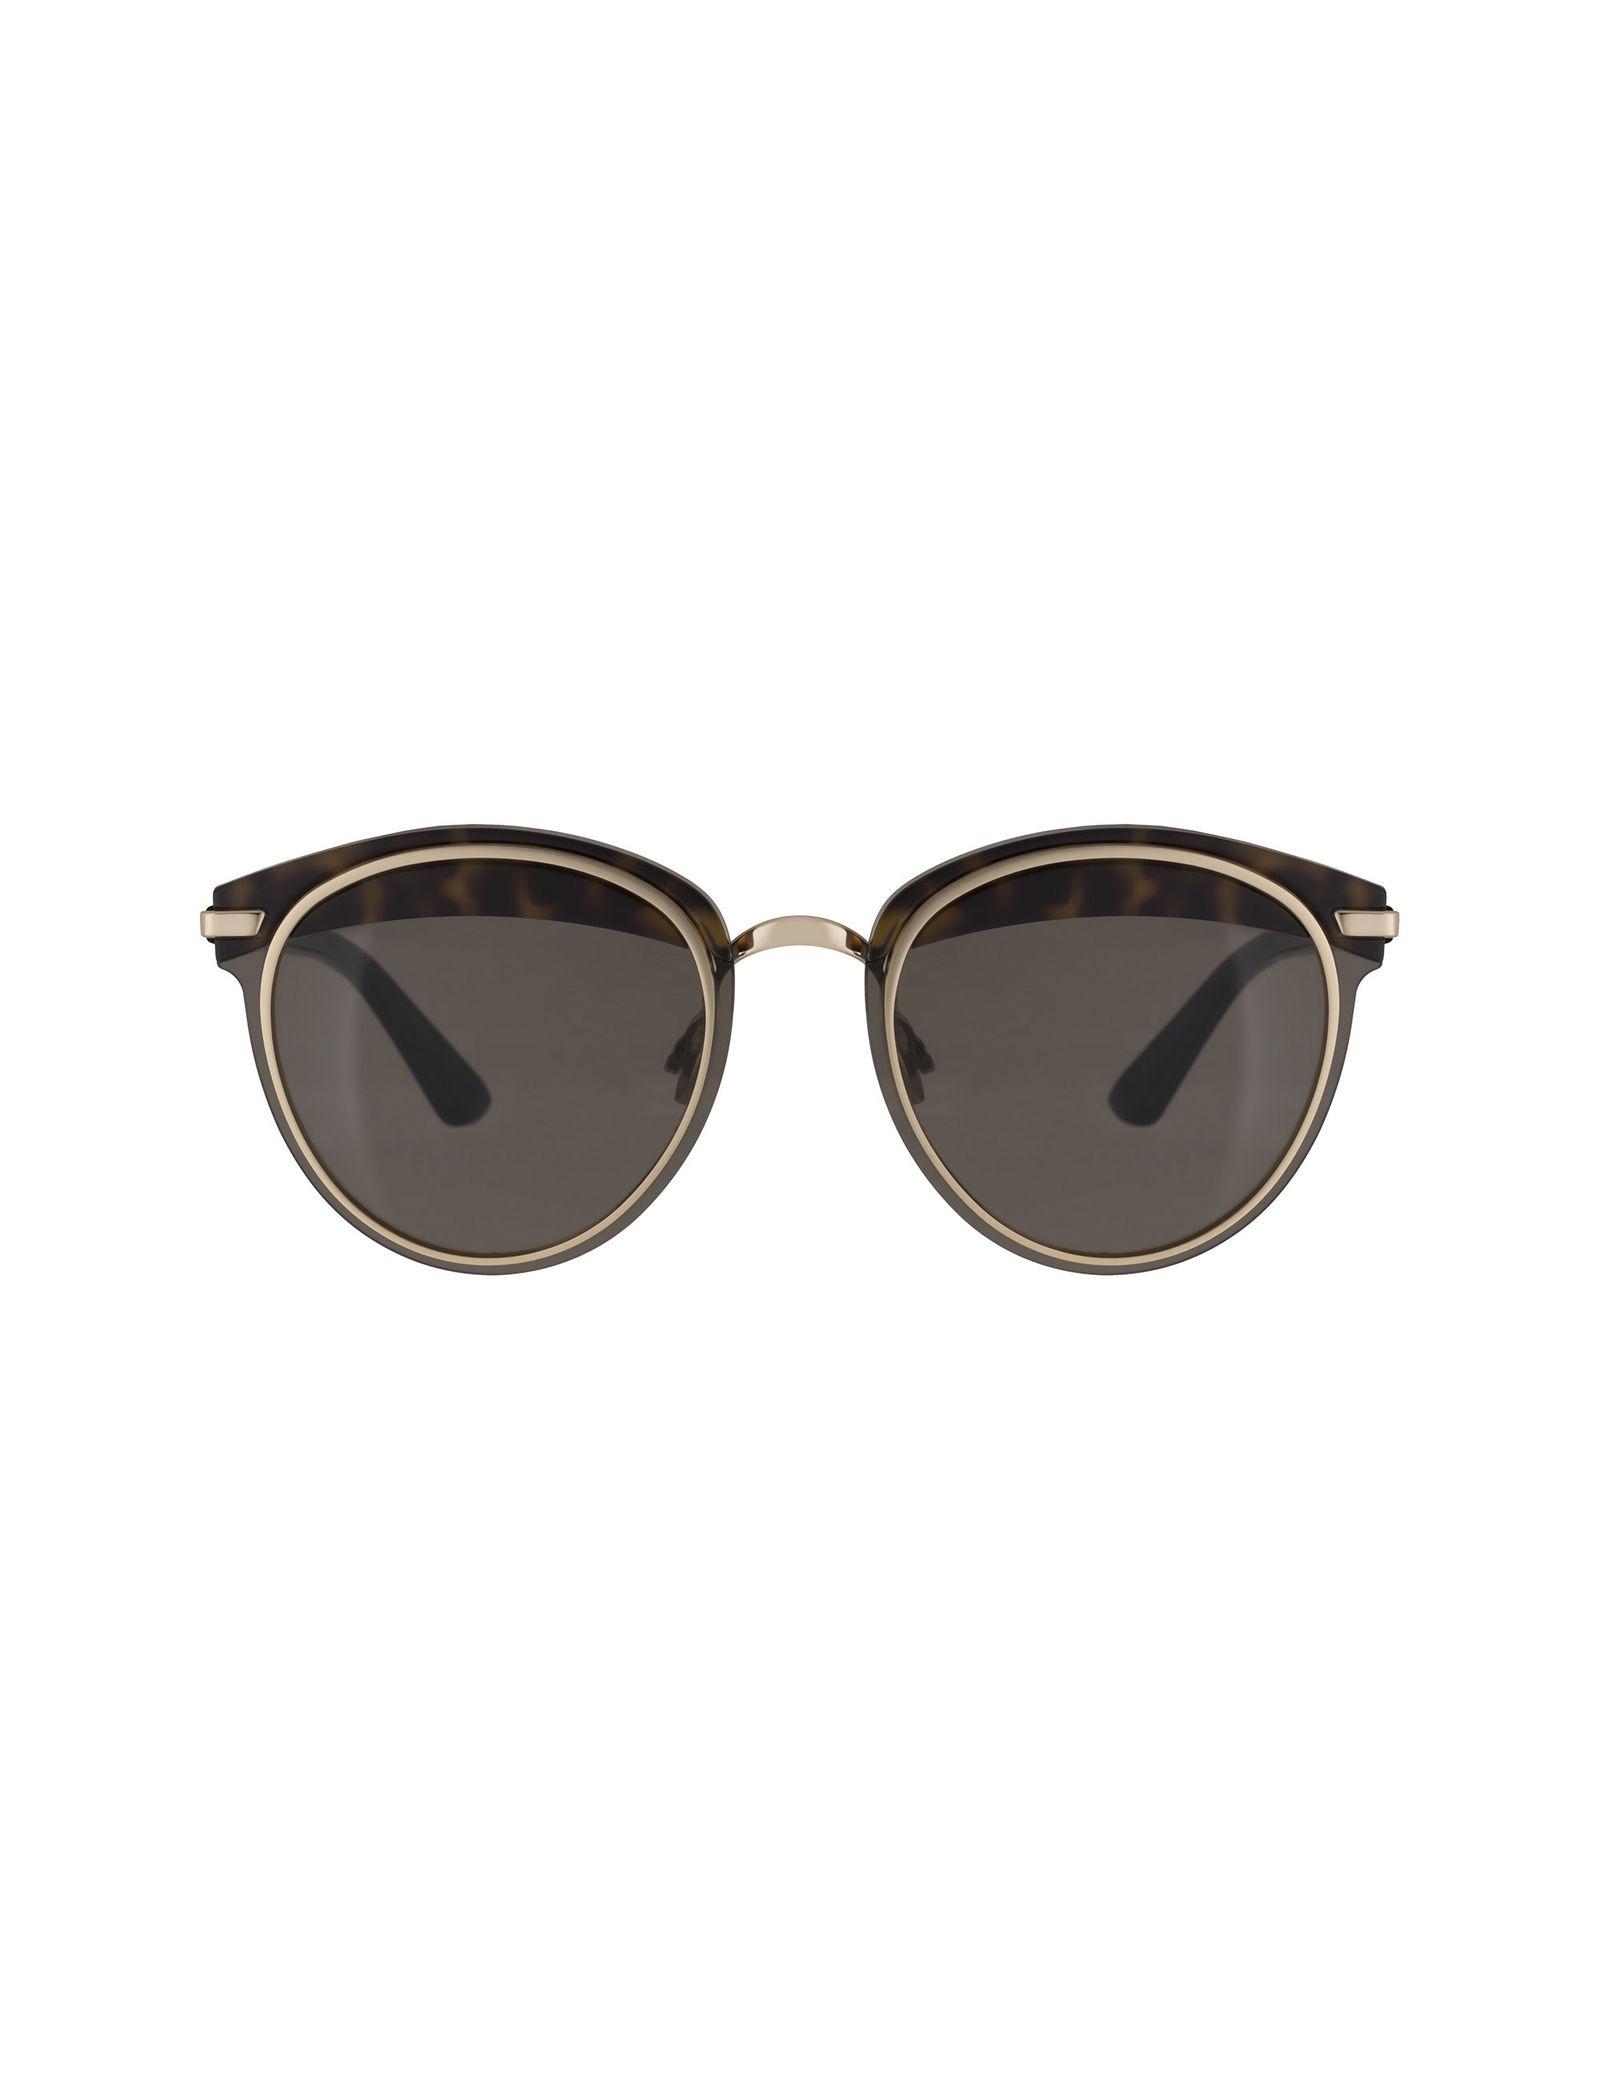 عینک آفتابی پنتوس زنانه - دیور - مشکي لاک پشتي - 1